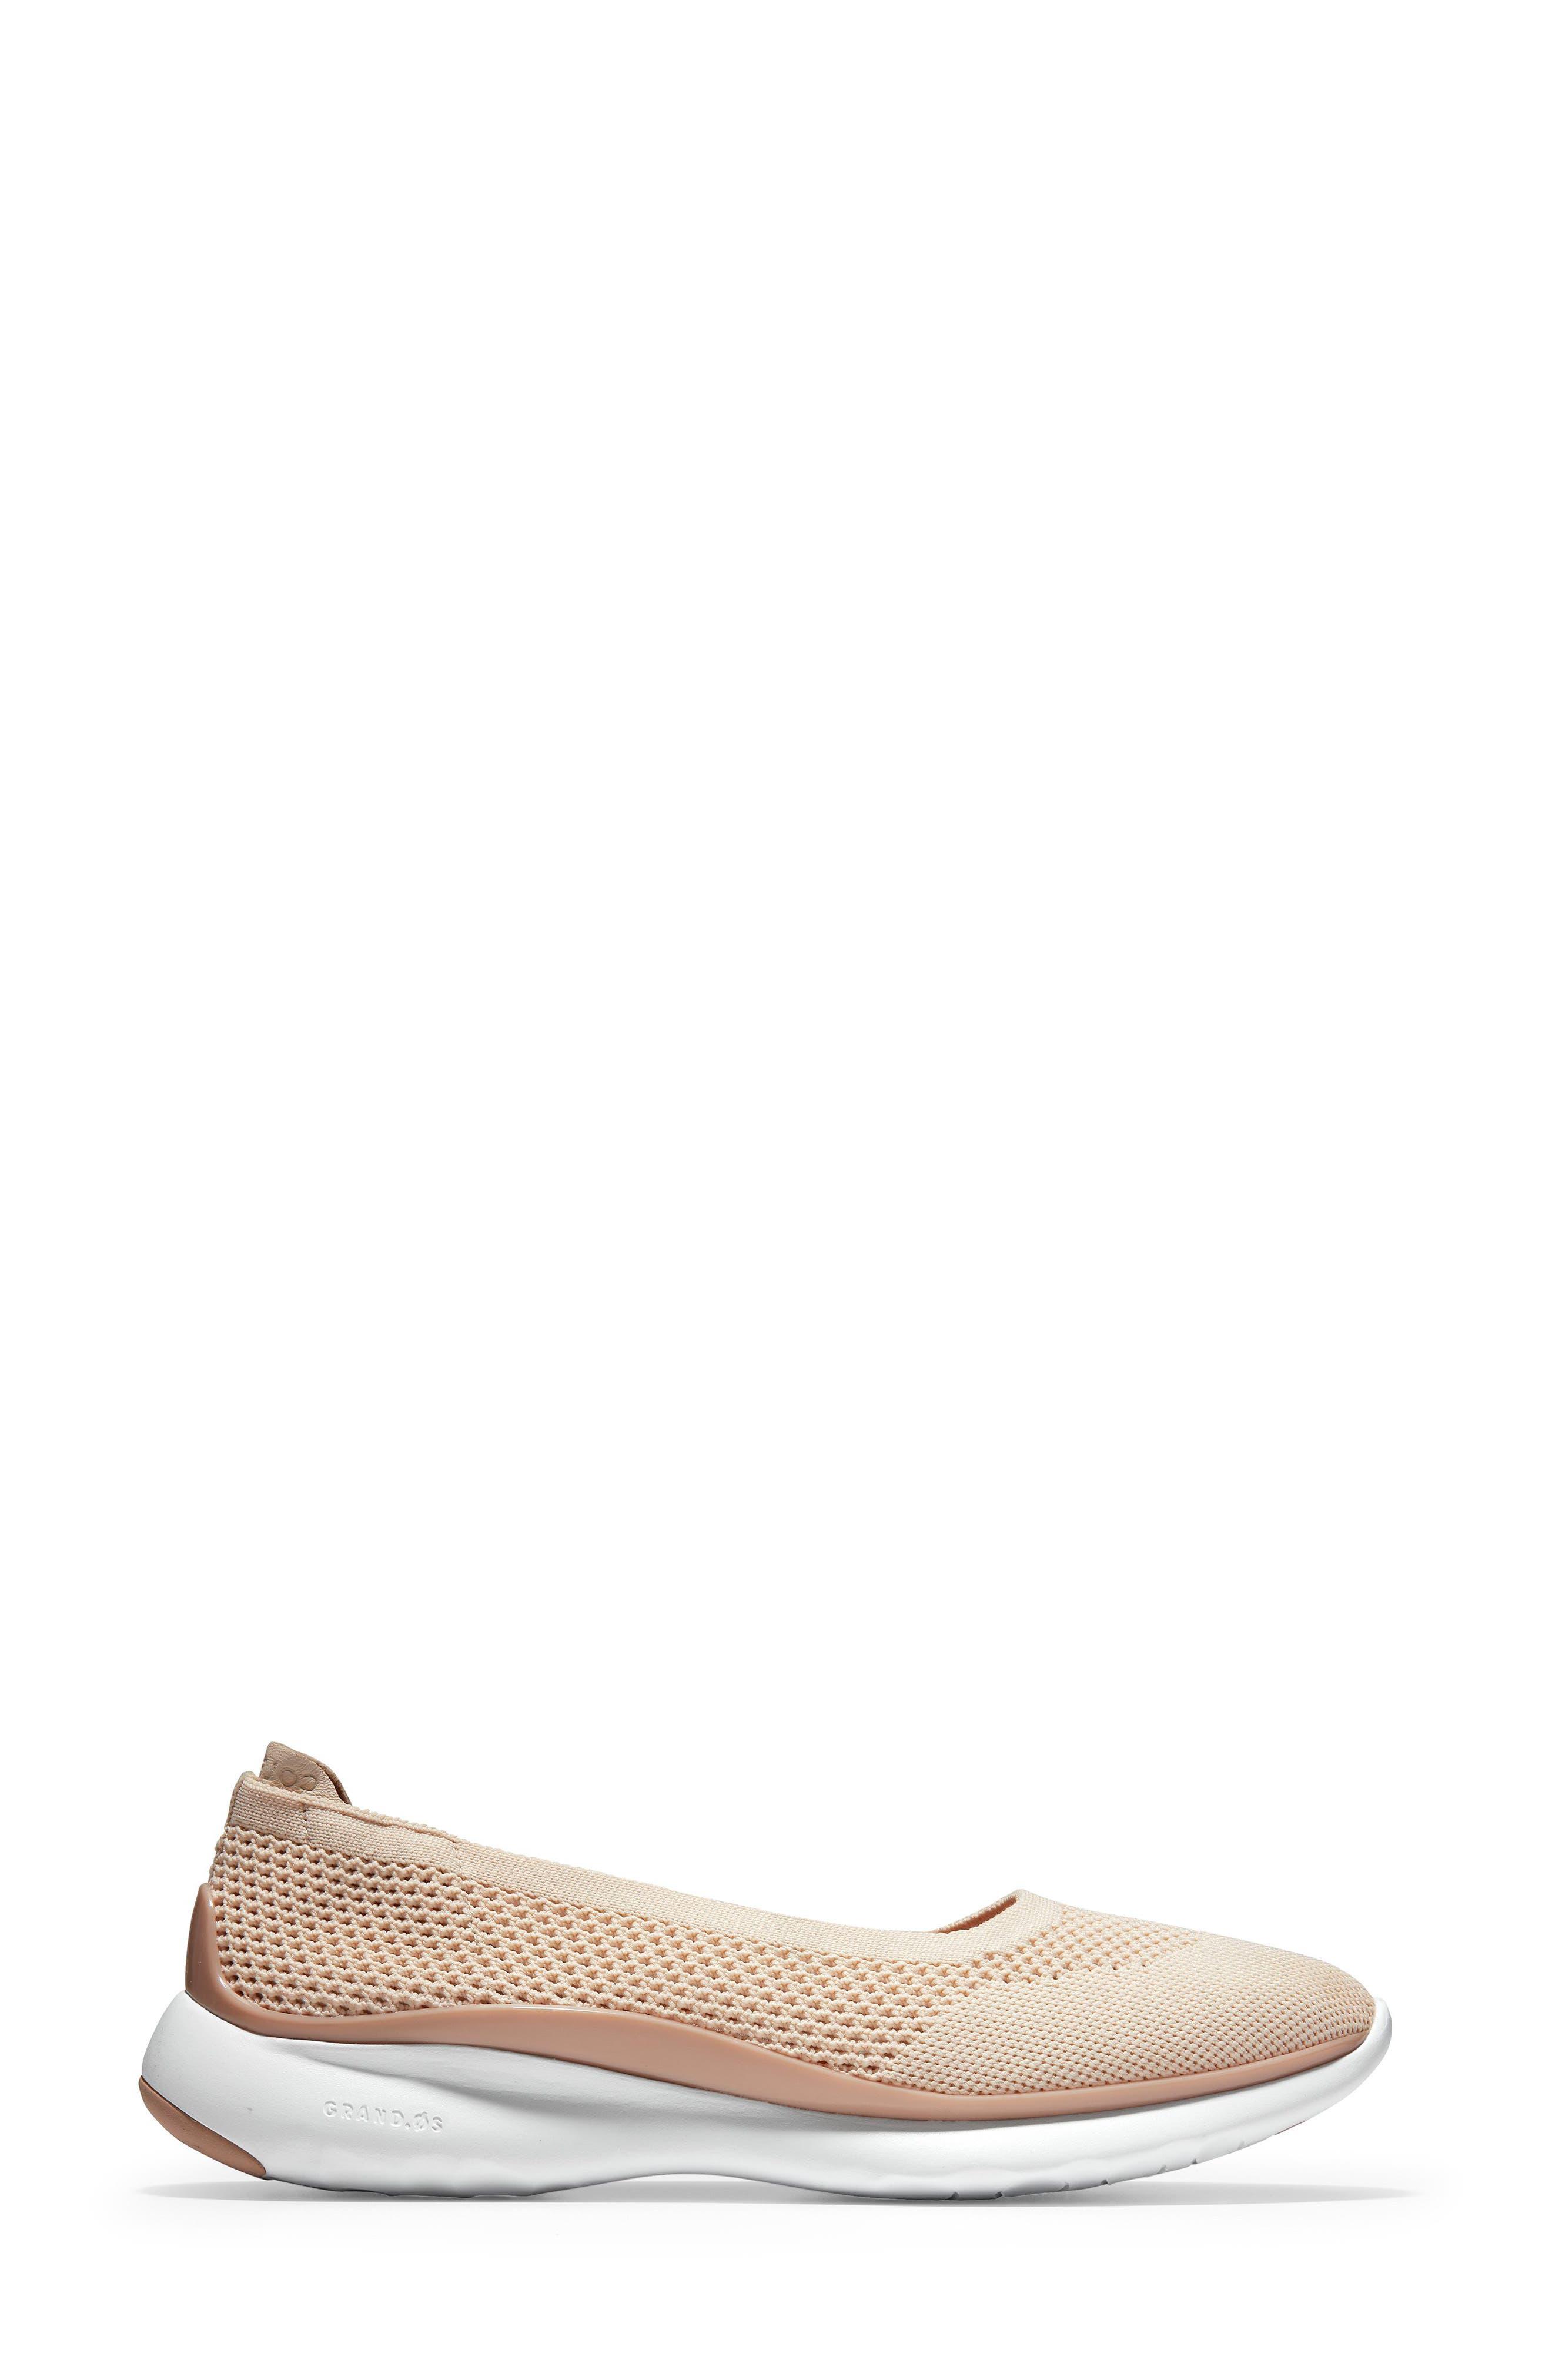 ZeroGrand Knit Sneaker,                             Alternate thumbnail 3, color,                             SAND/ ROSE KNIT/ LEATHER